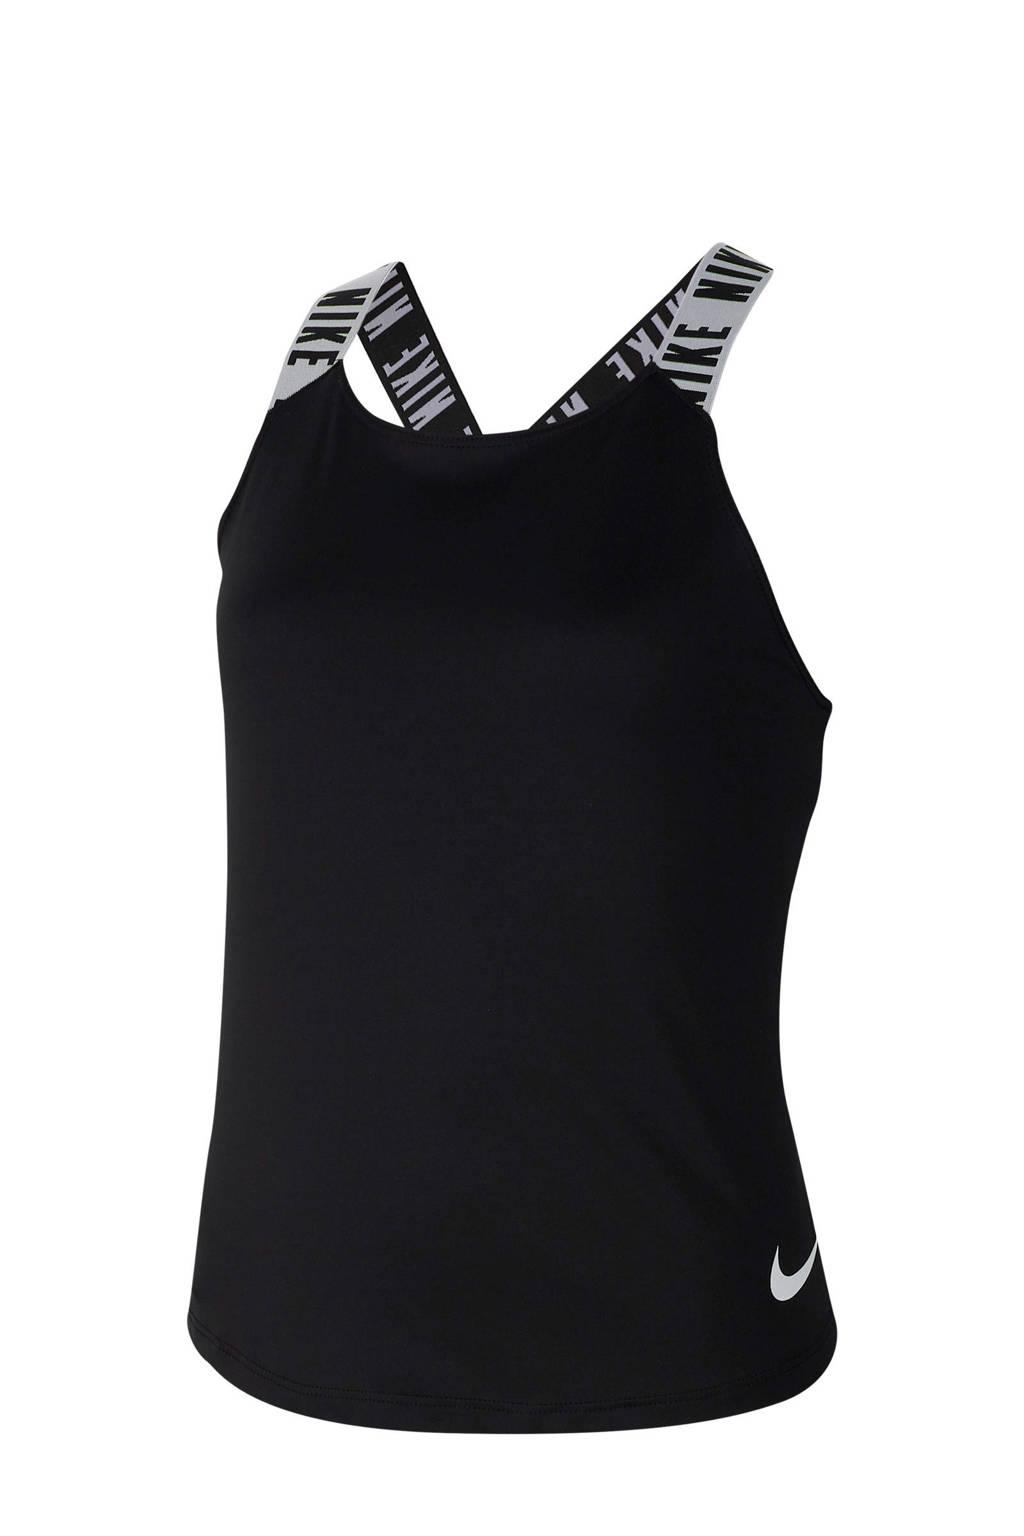 Nike top zwart/wit, Zwart/wit